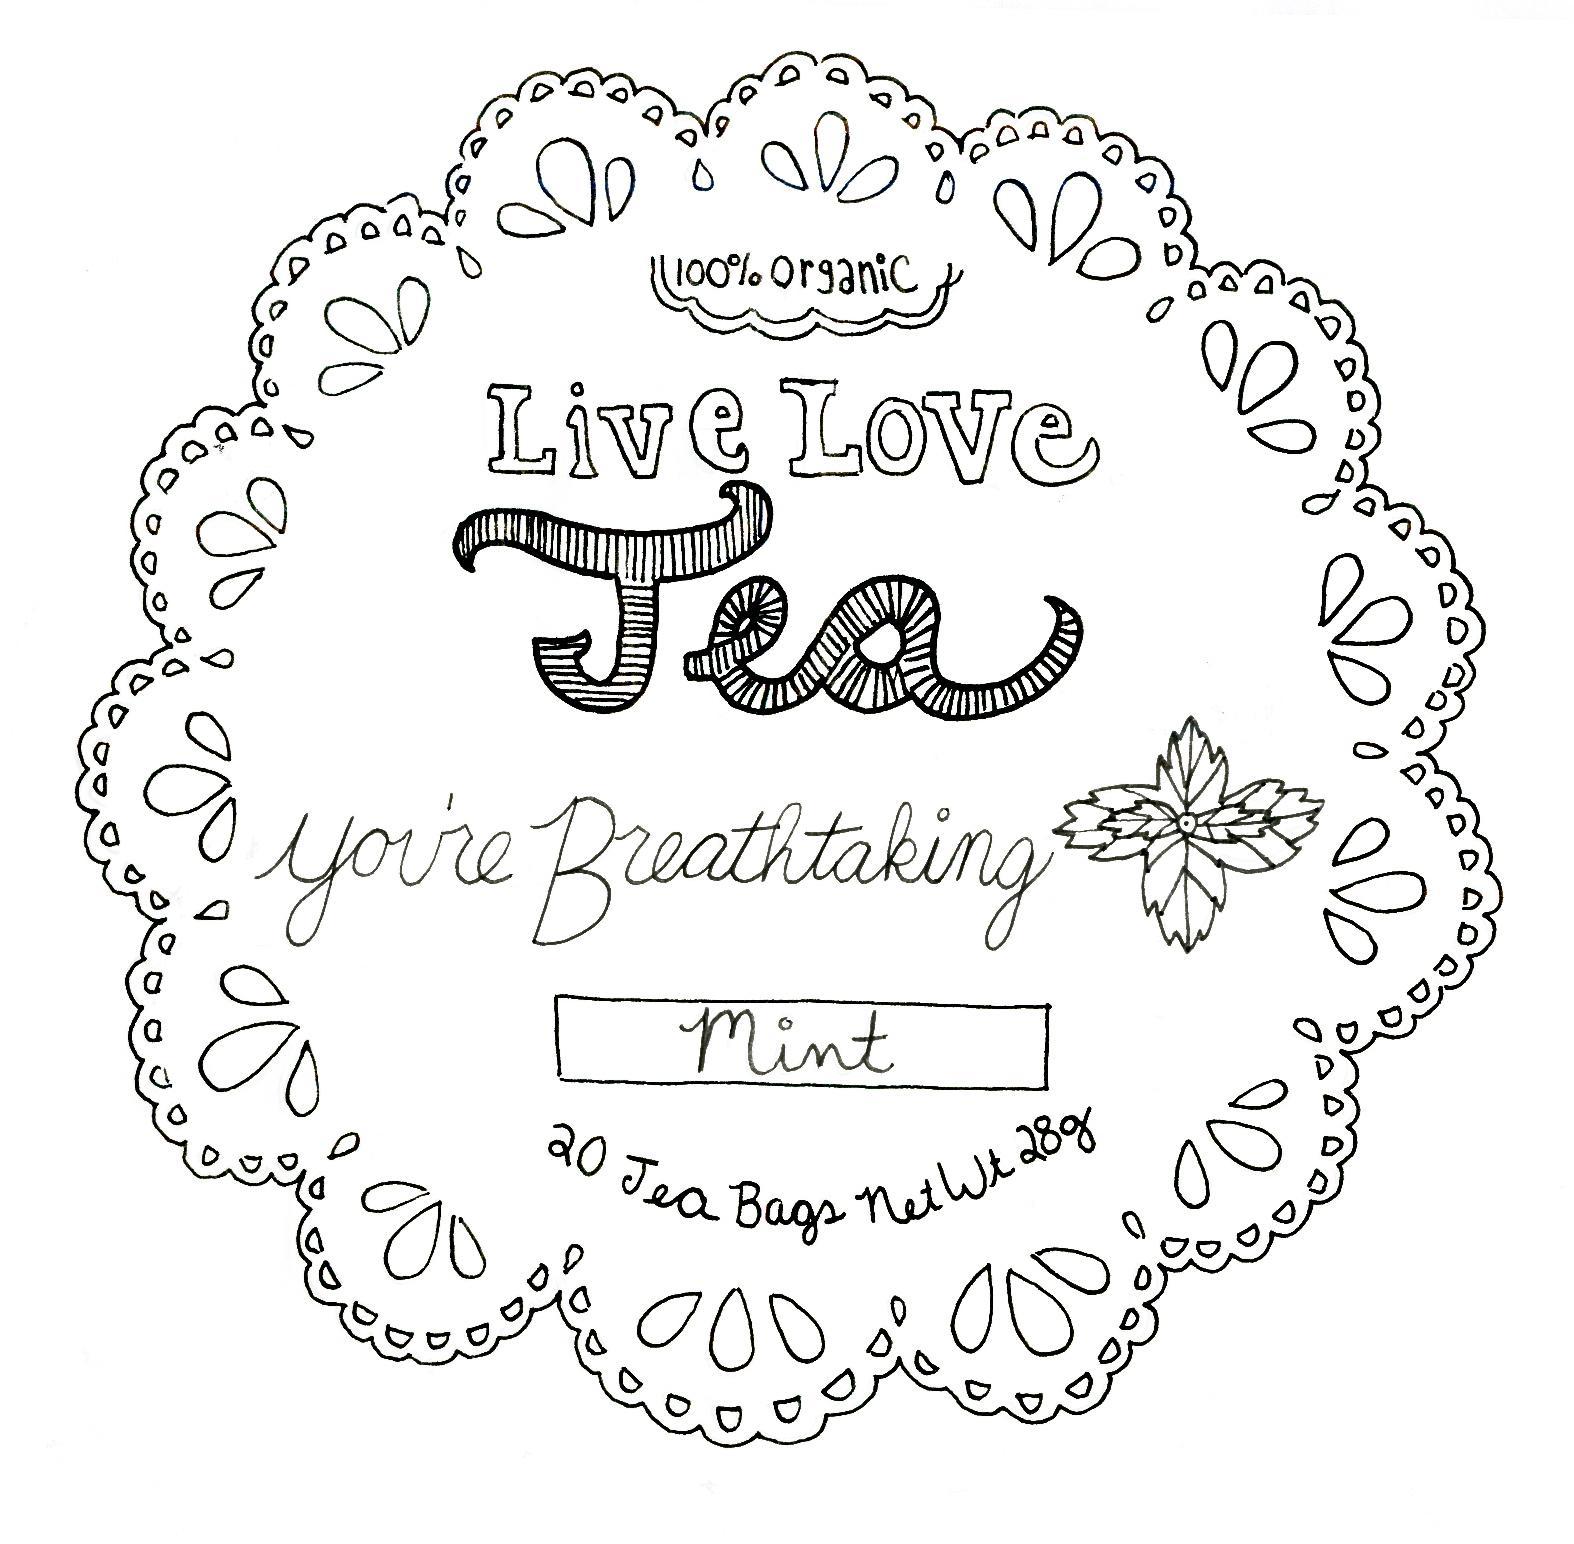 Live.Love.Tea. - image 20 - student project